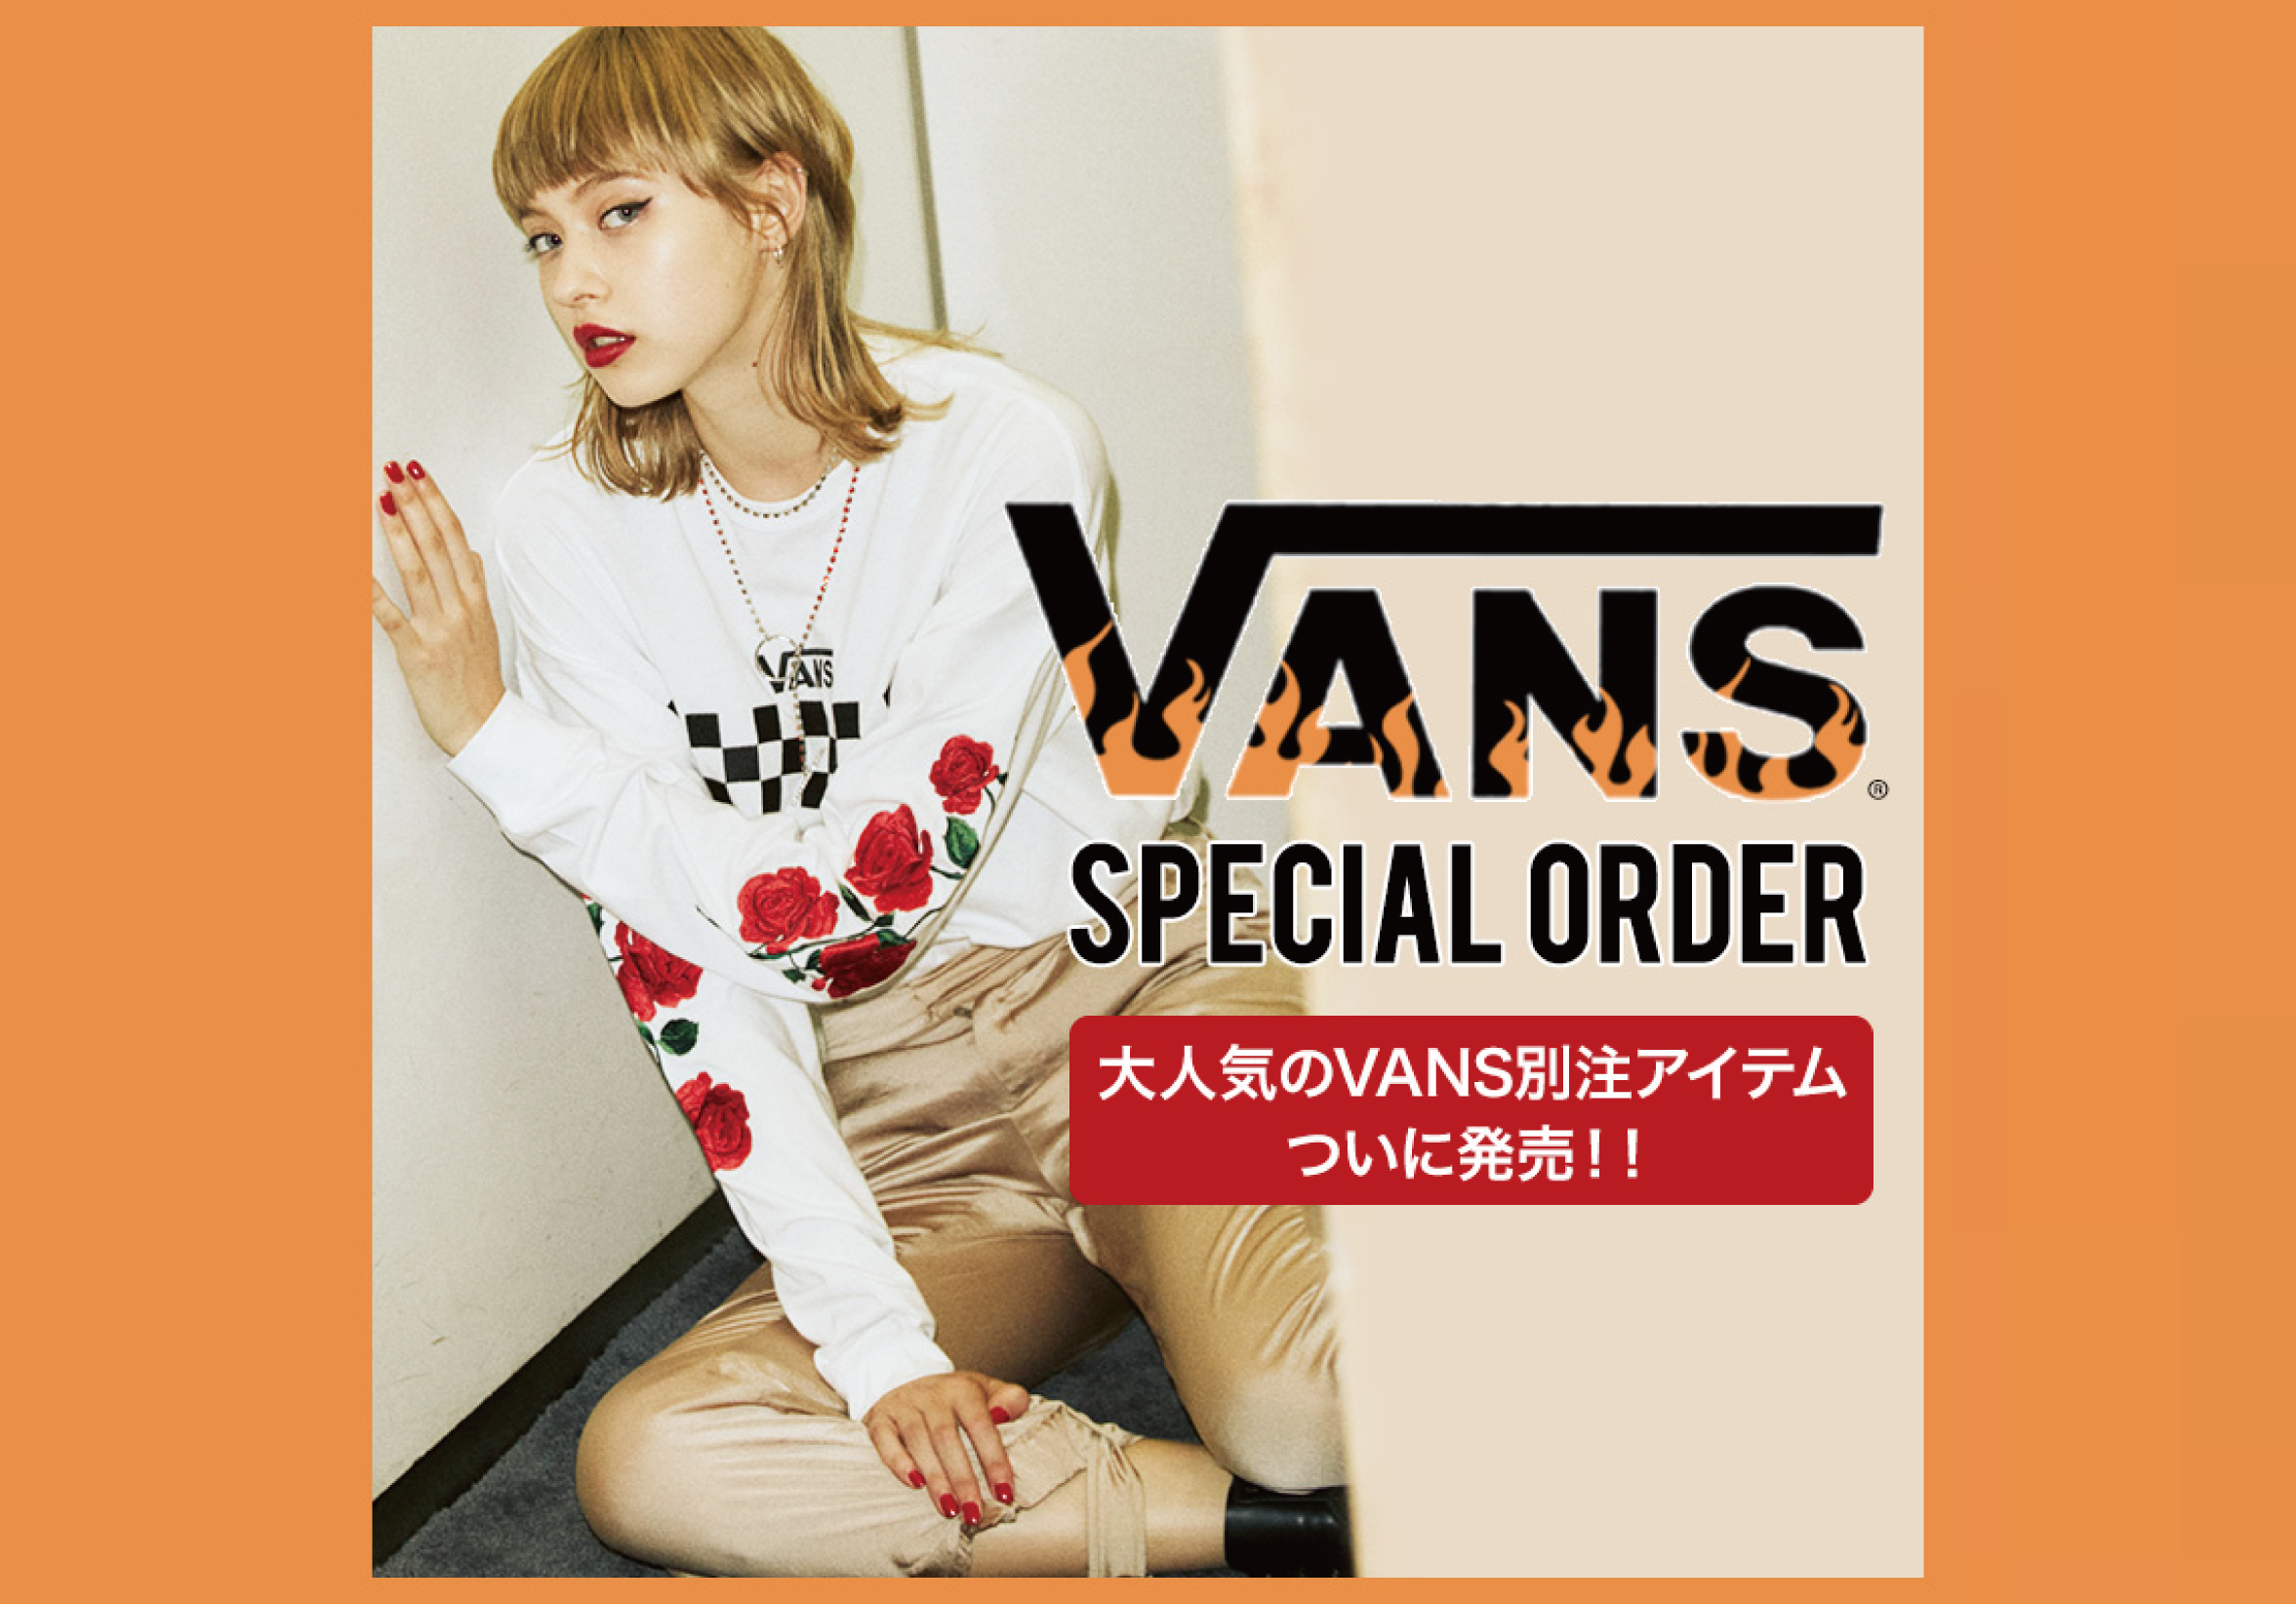 【VANS SPECIAL ORDER】